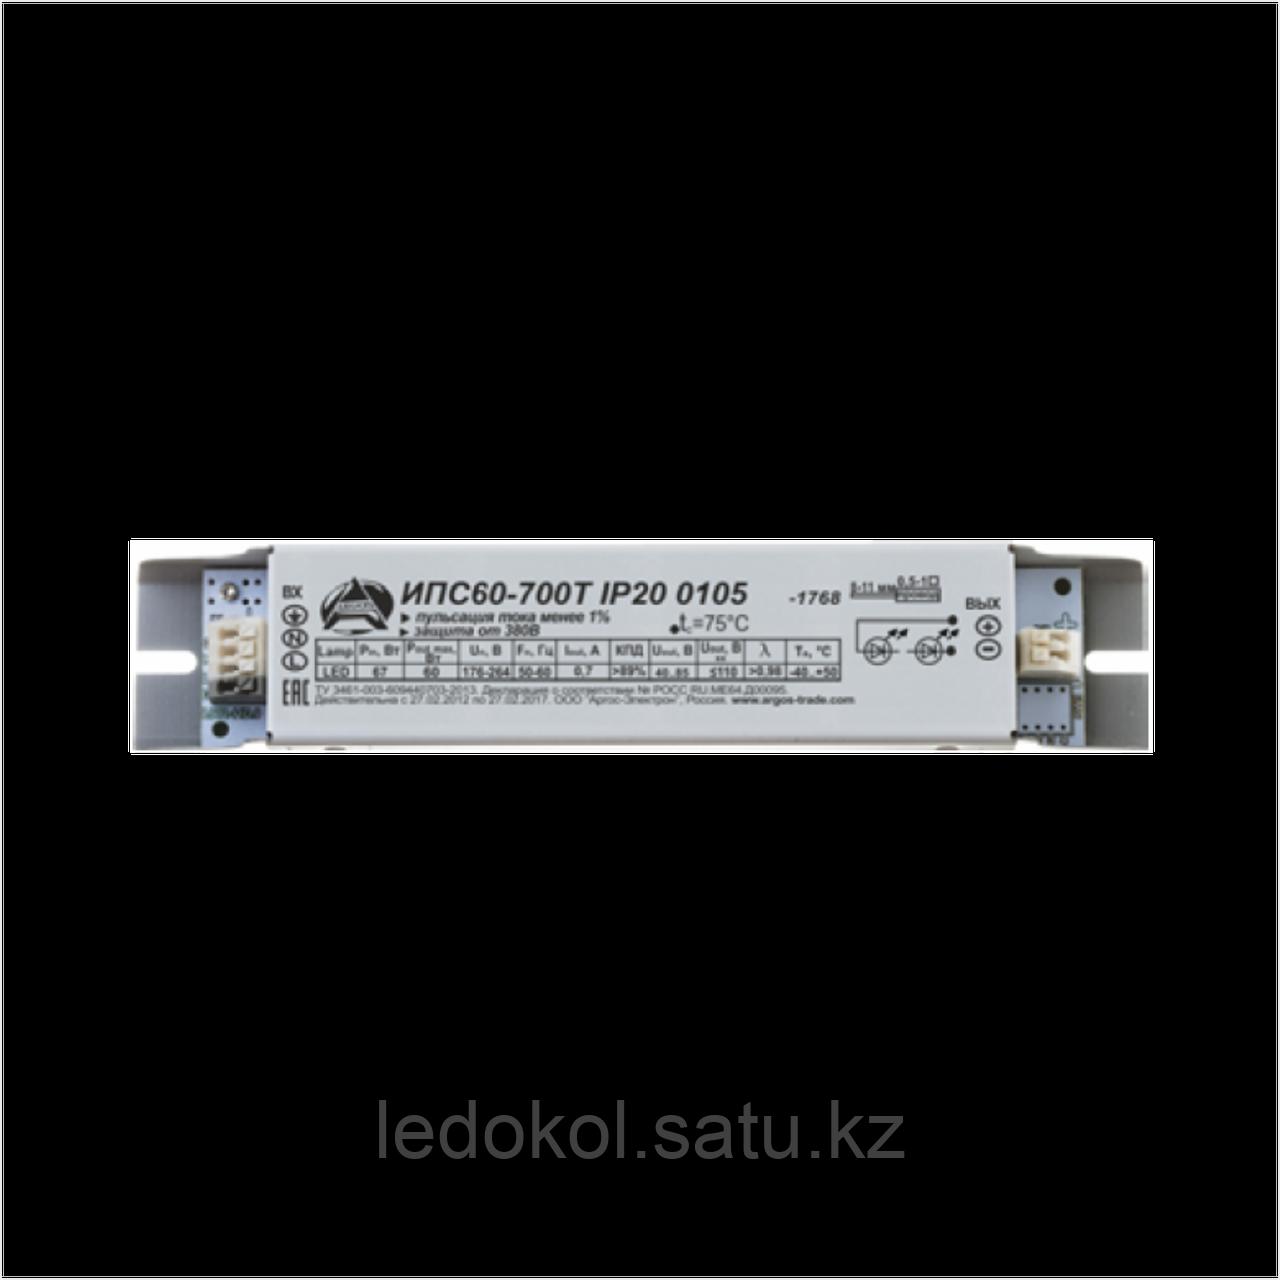 Источник питания Аргос ИПС60-1050ТД (750-1050) IP20 0100